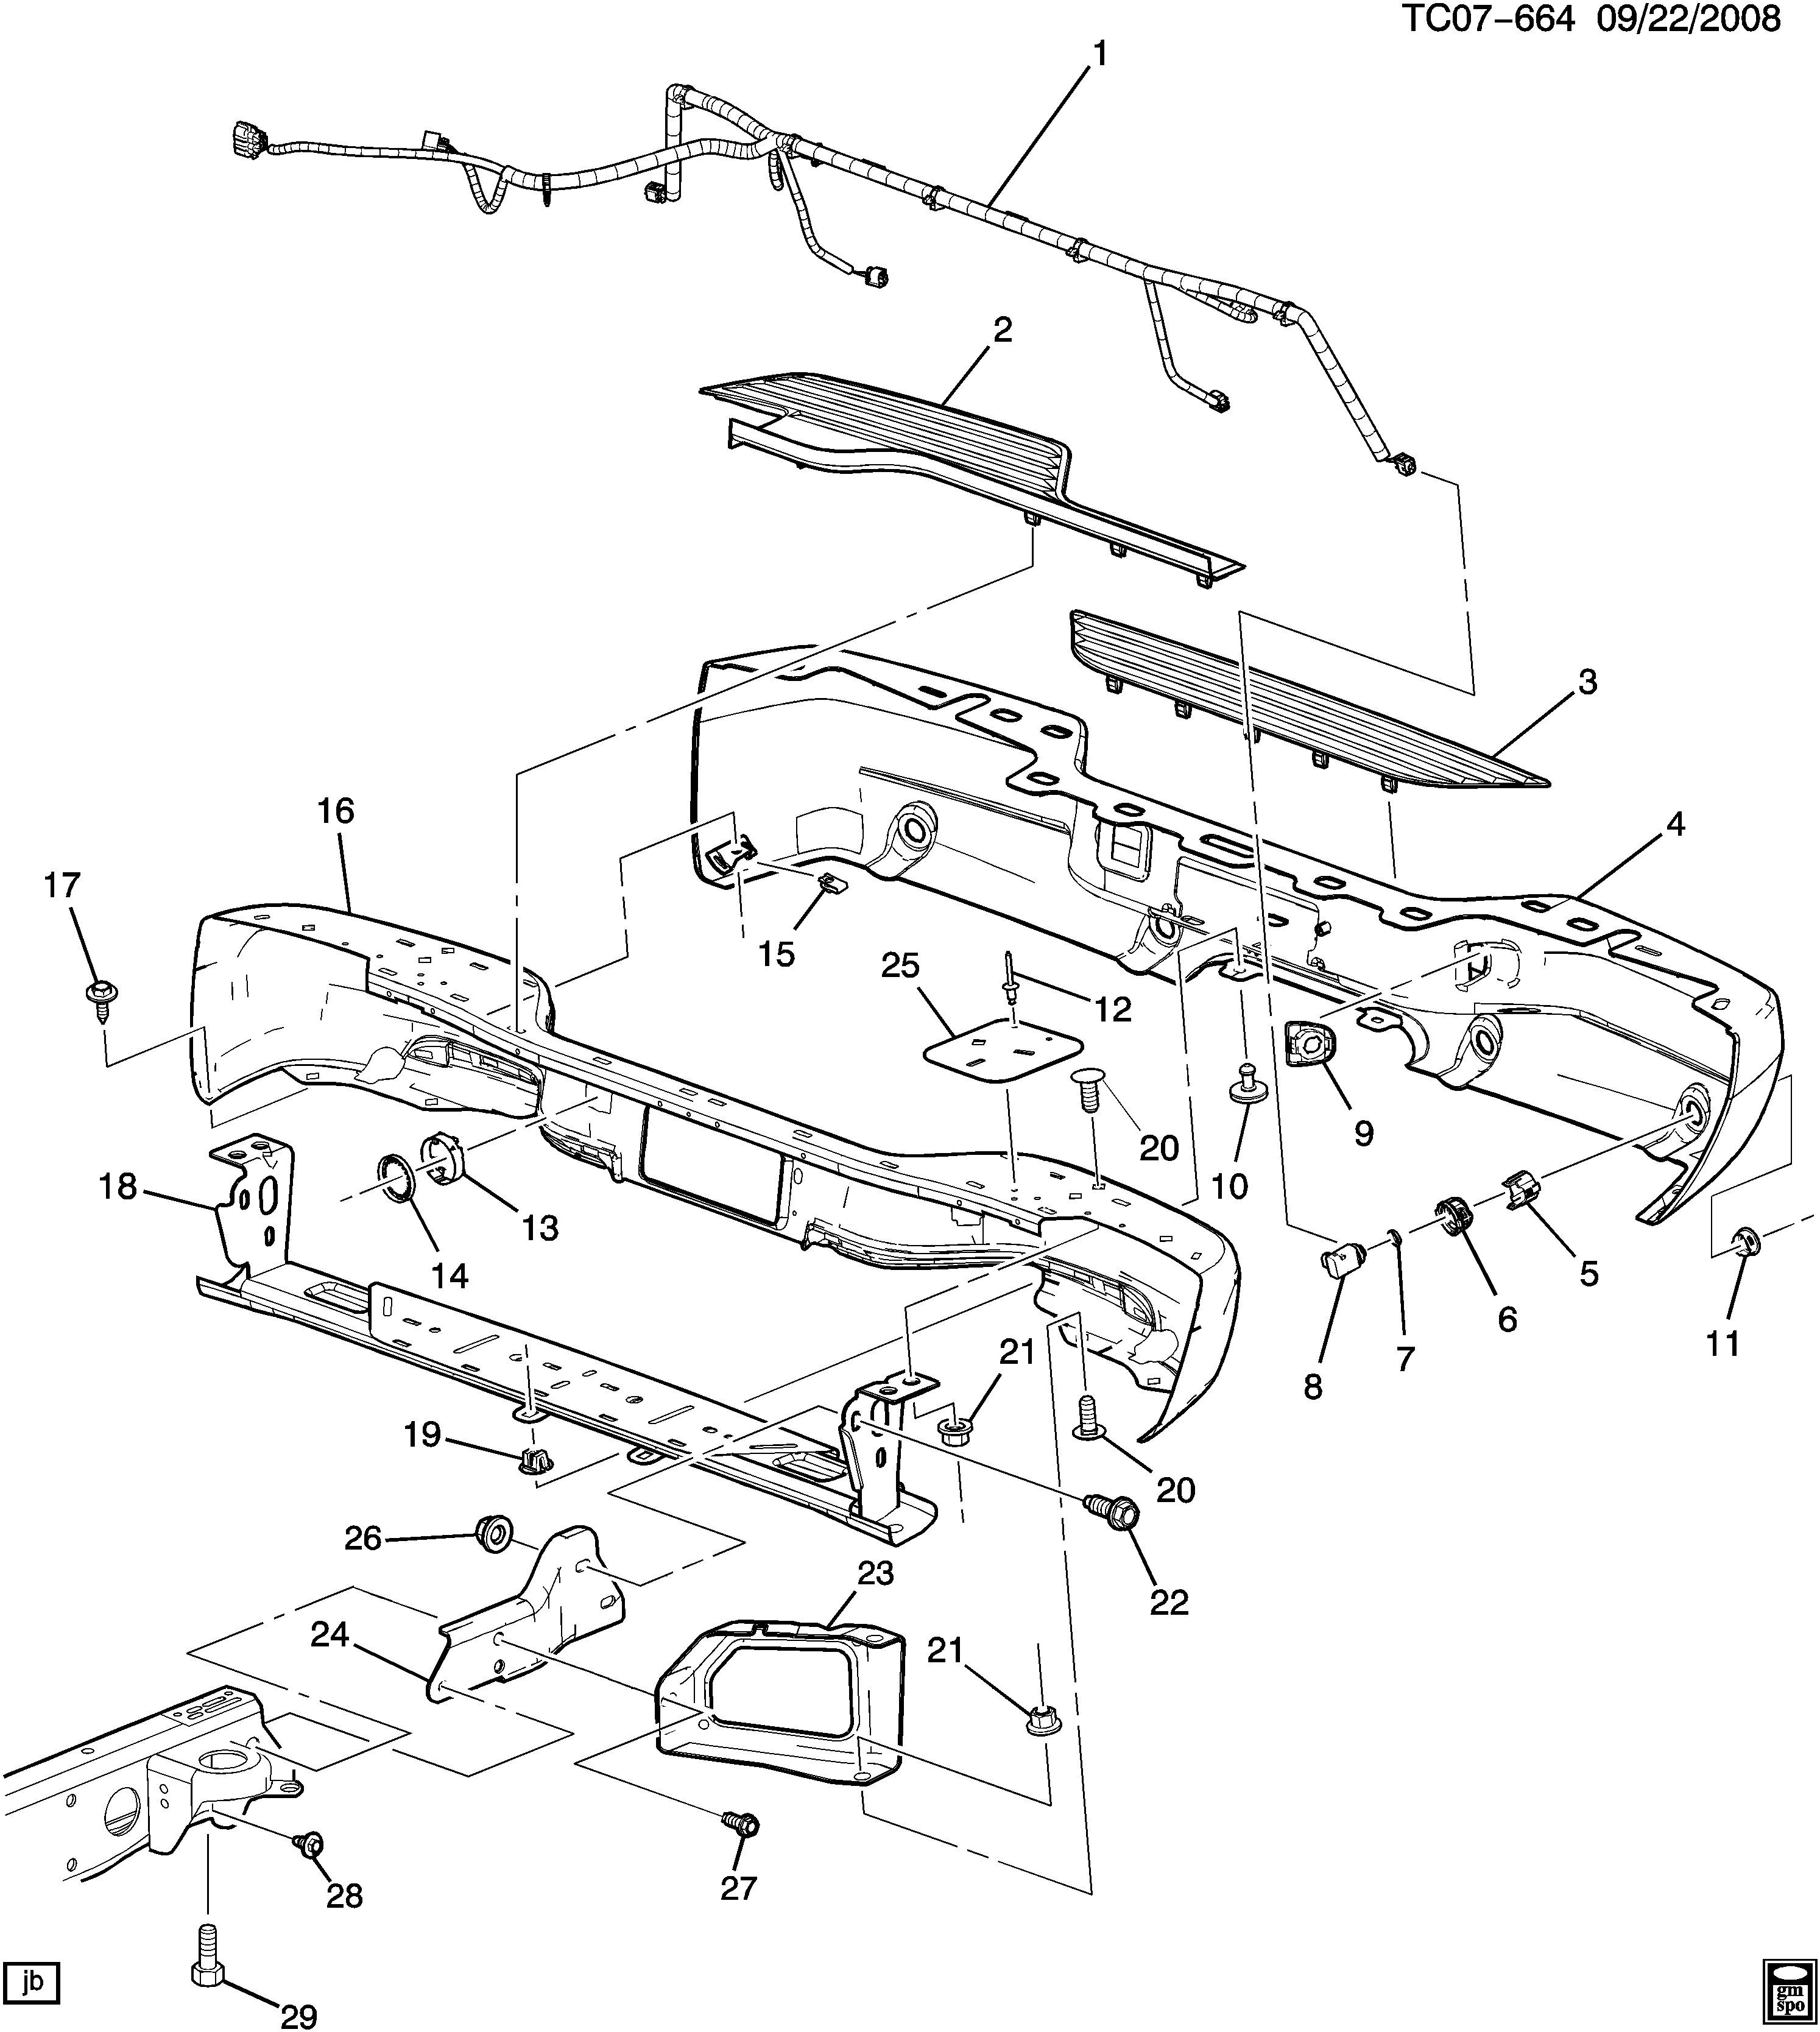 K159(36) BUMPER/REAR (CADILLAC